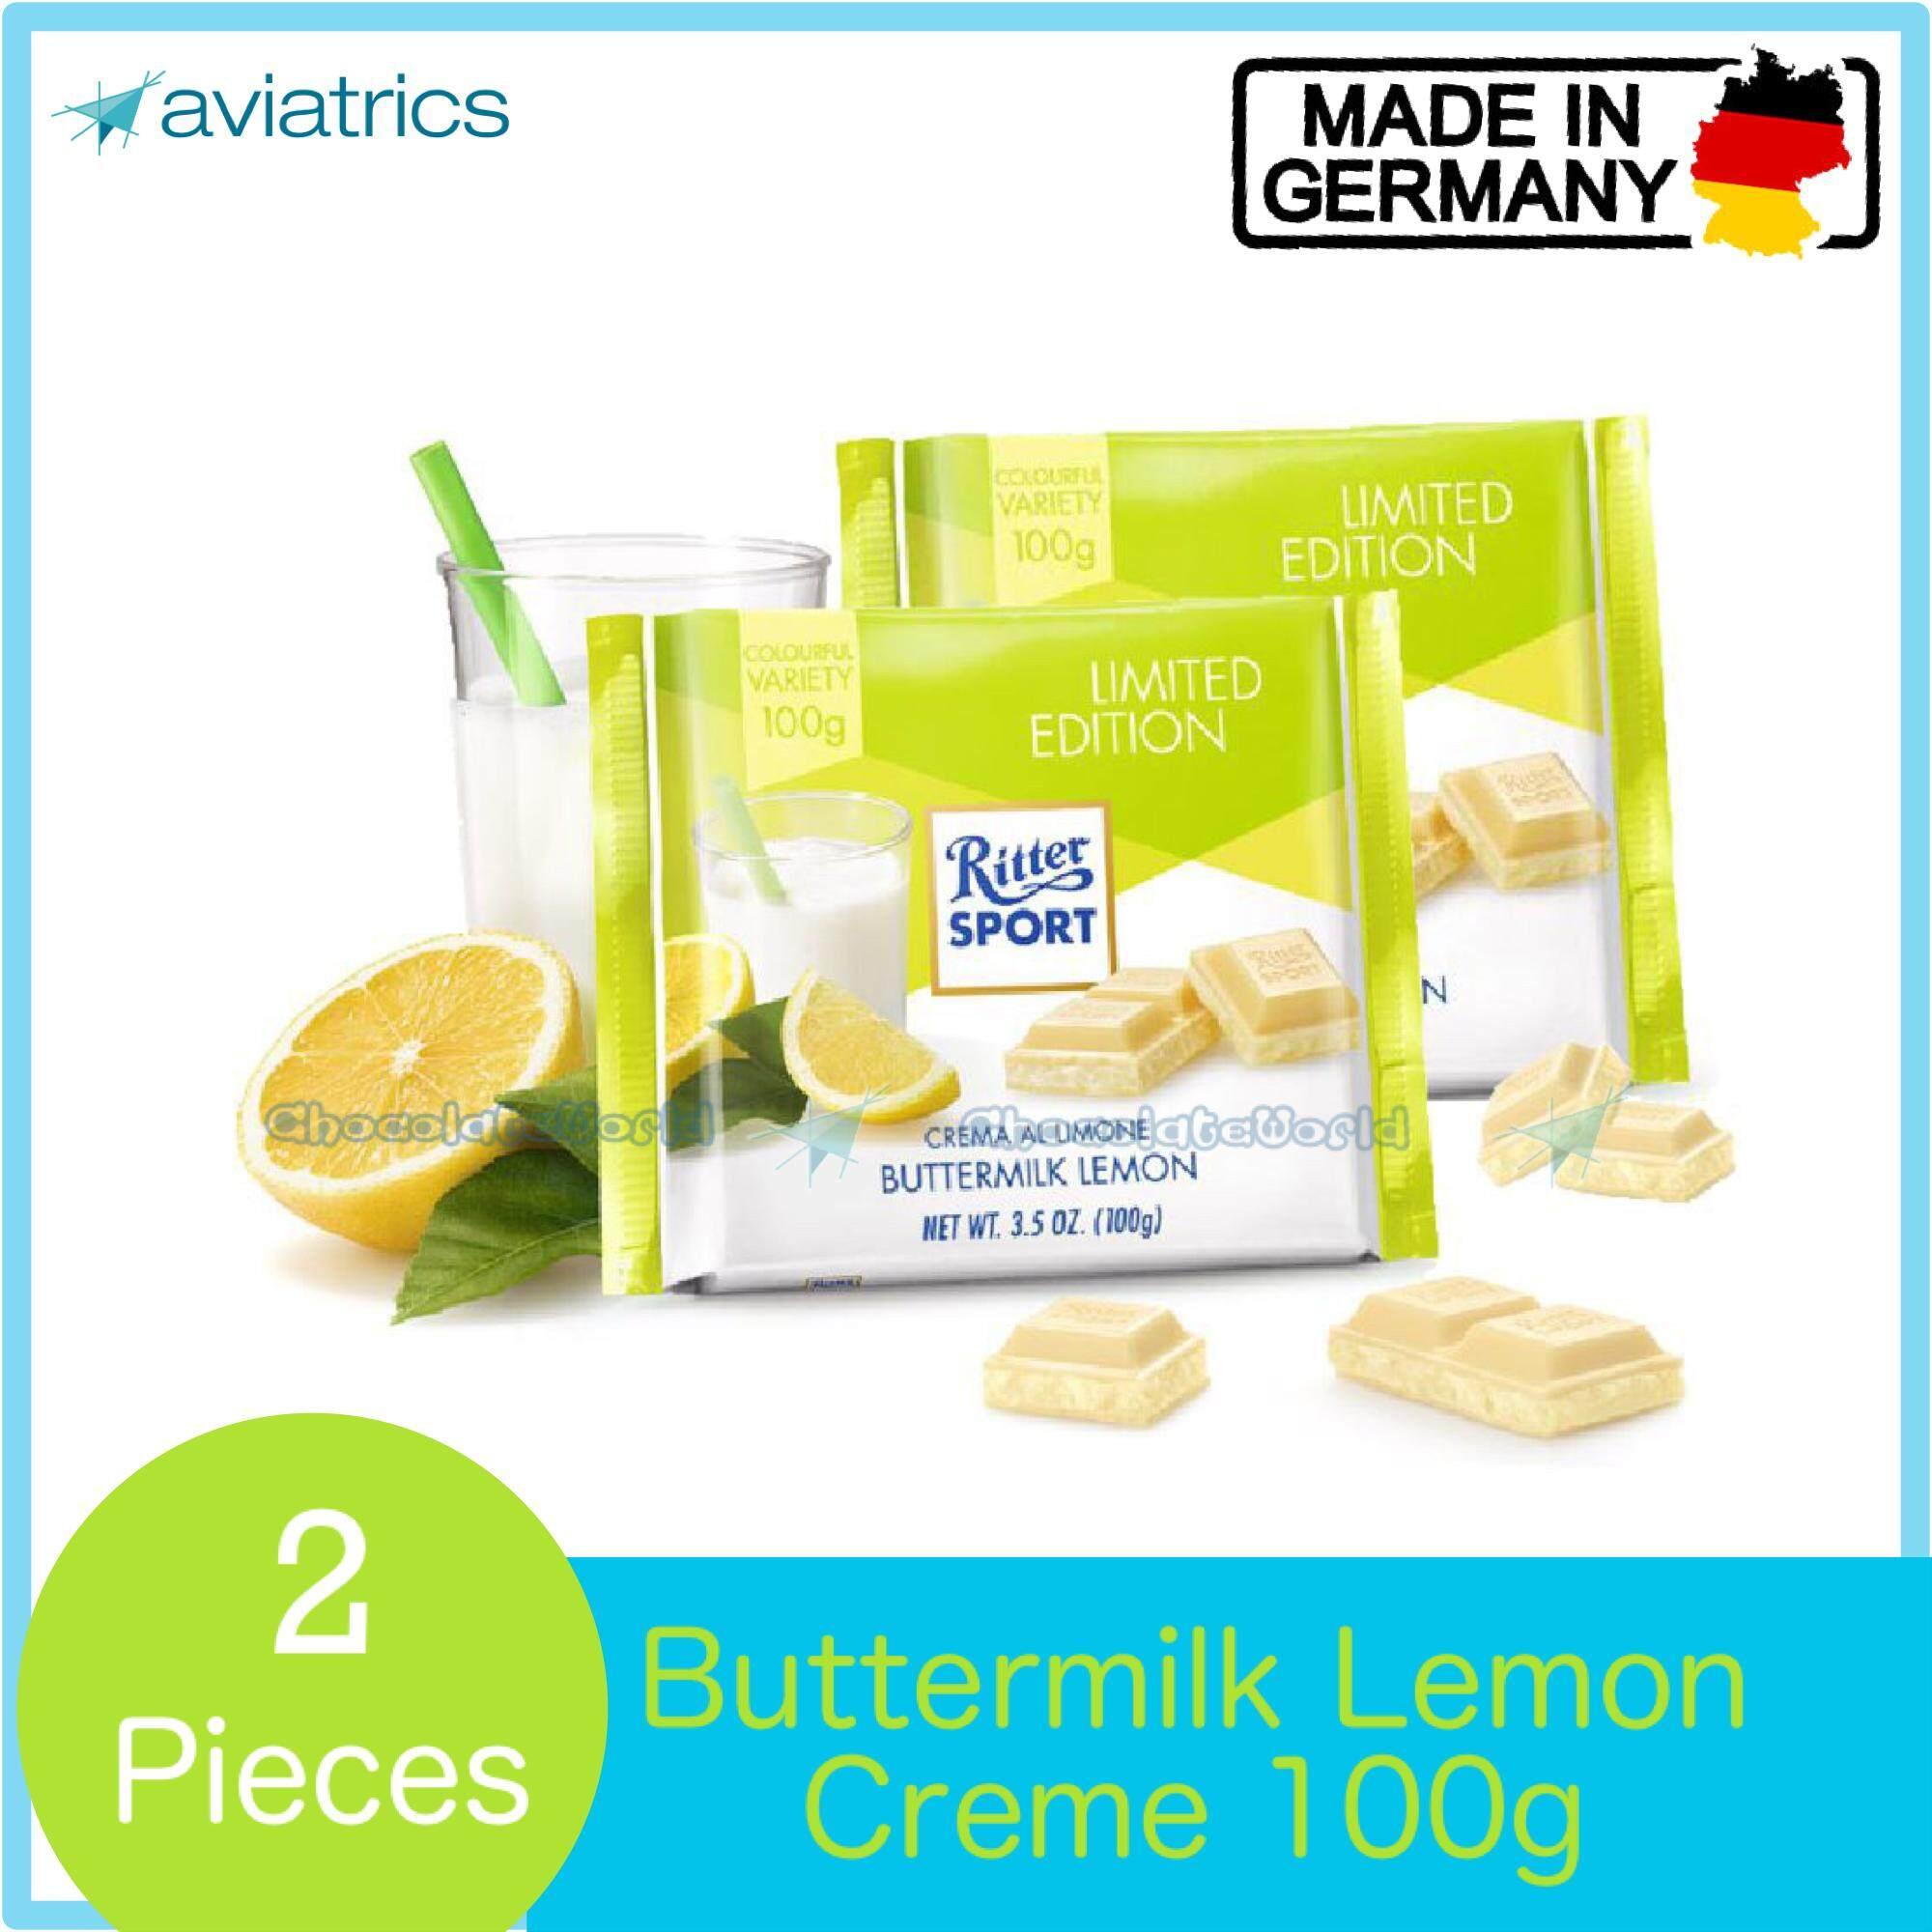 Ritter Sport Buttermilk Lemon 2 X 100g (Made in Germany)